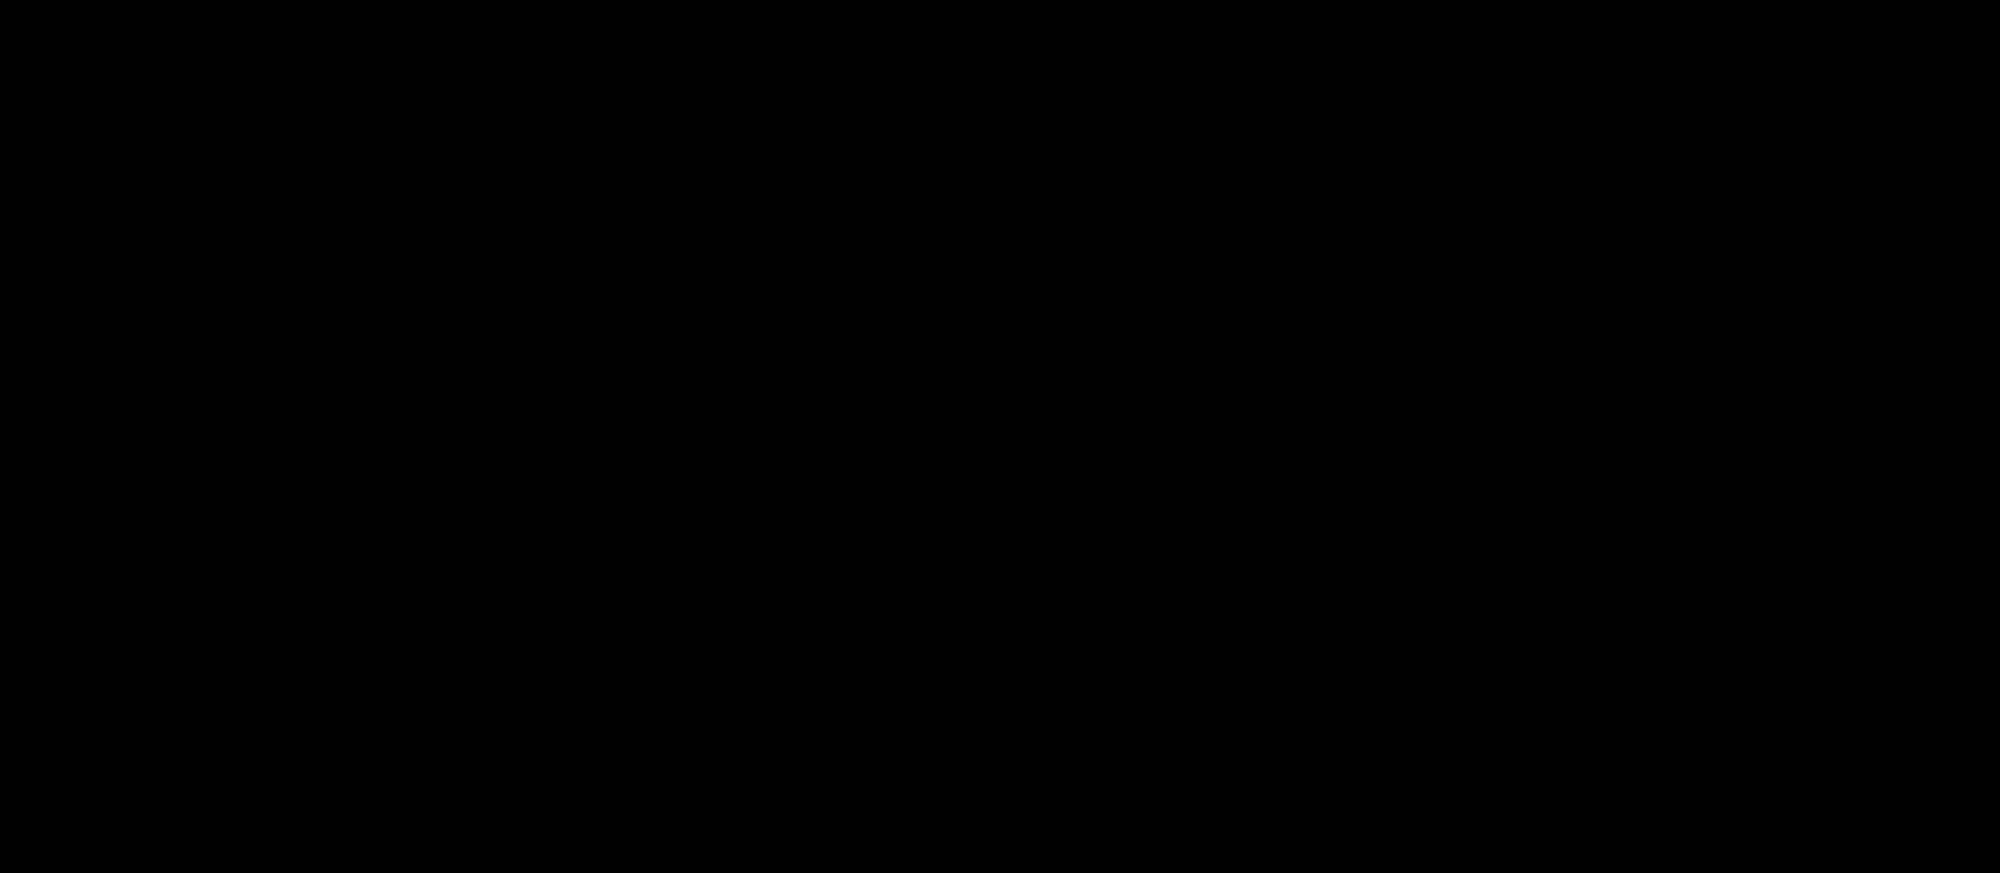 MOTT STREET GROUP INC.-logo-black.png